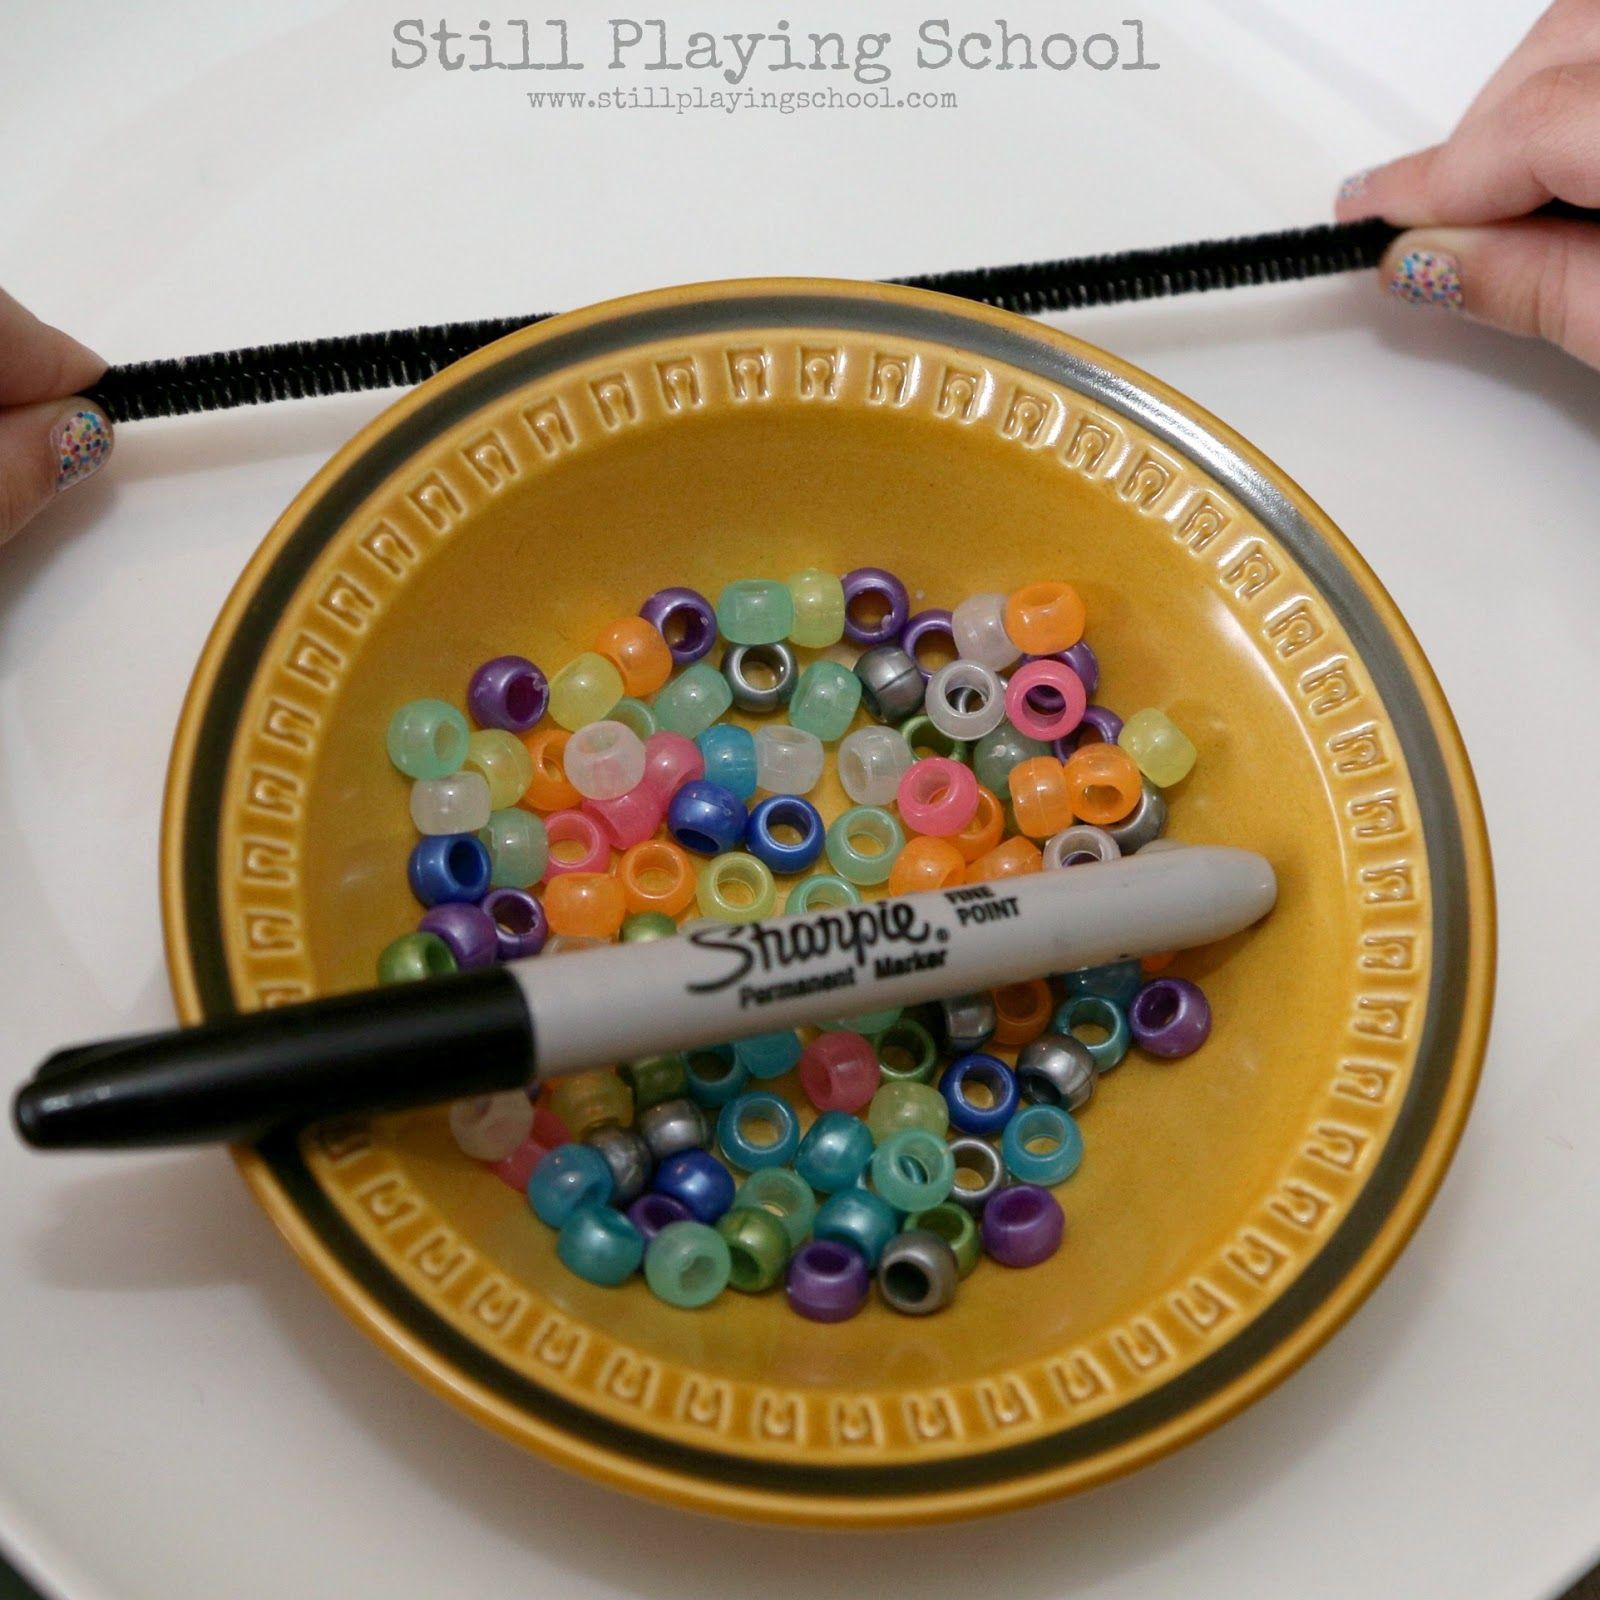 Craft Ideas For Kids Solar System Part - 15: Solar System Bracelet Craft For Kids | Still Playing School